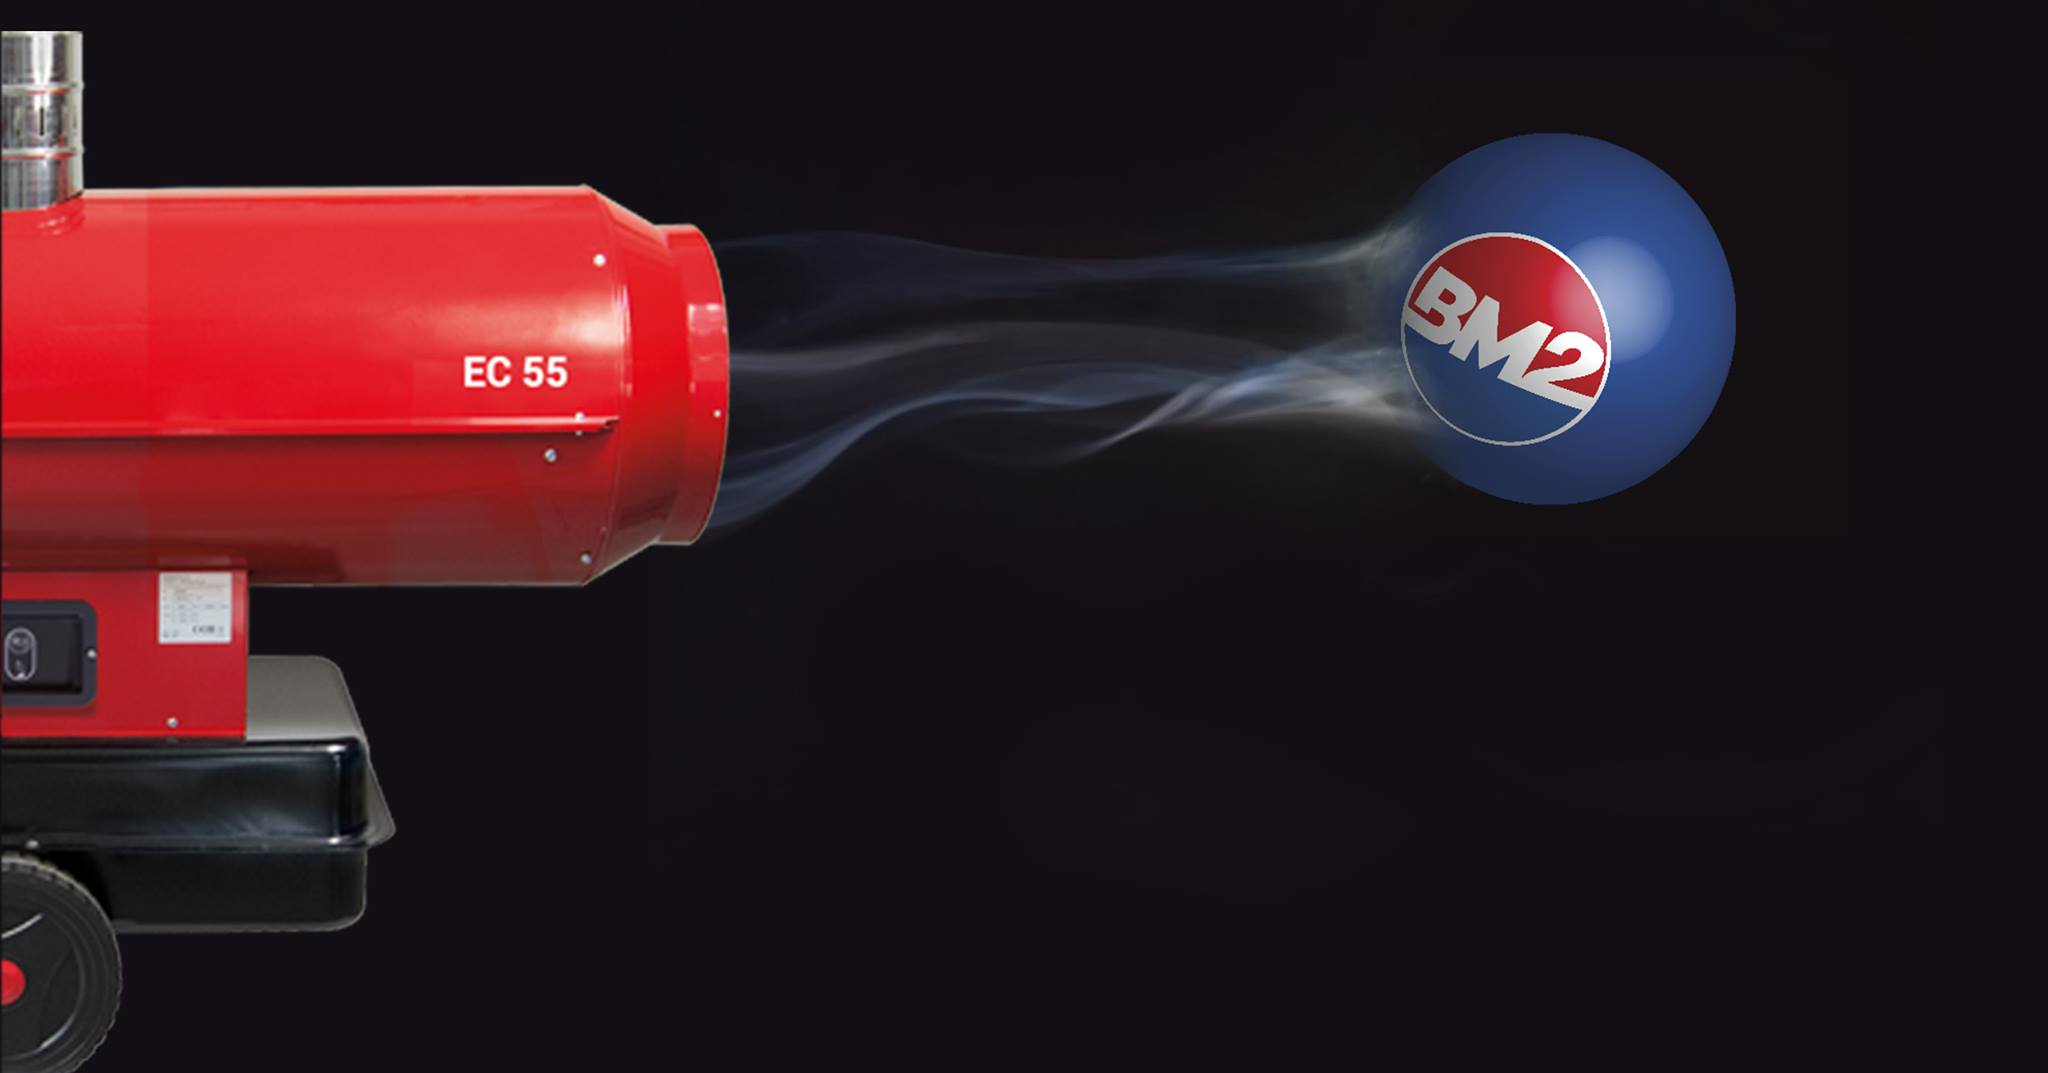 generatori d'aria calda biemmedue made in italy riscaldamento professionale.jpg